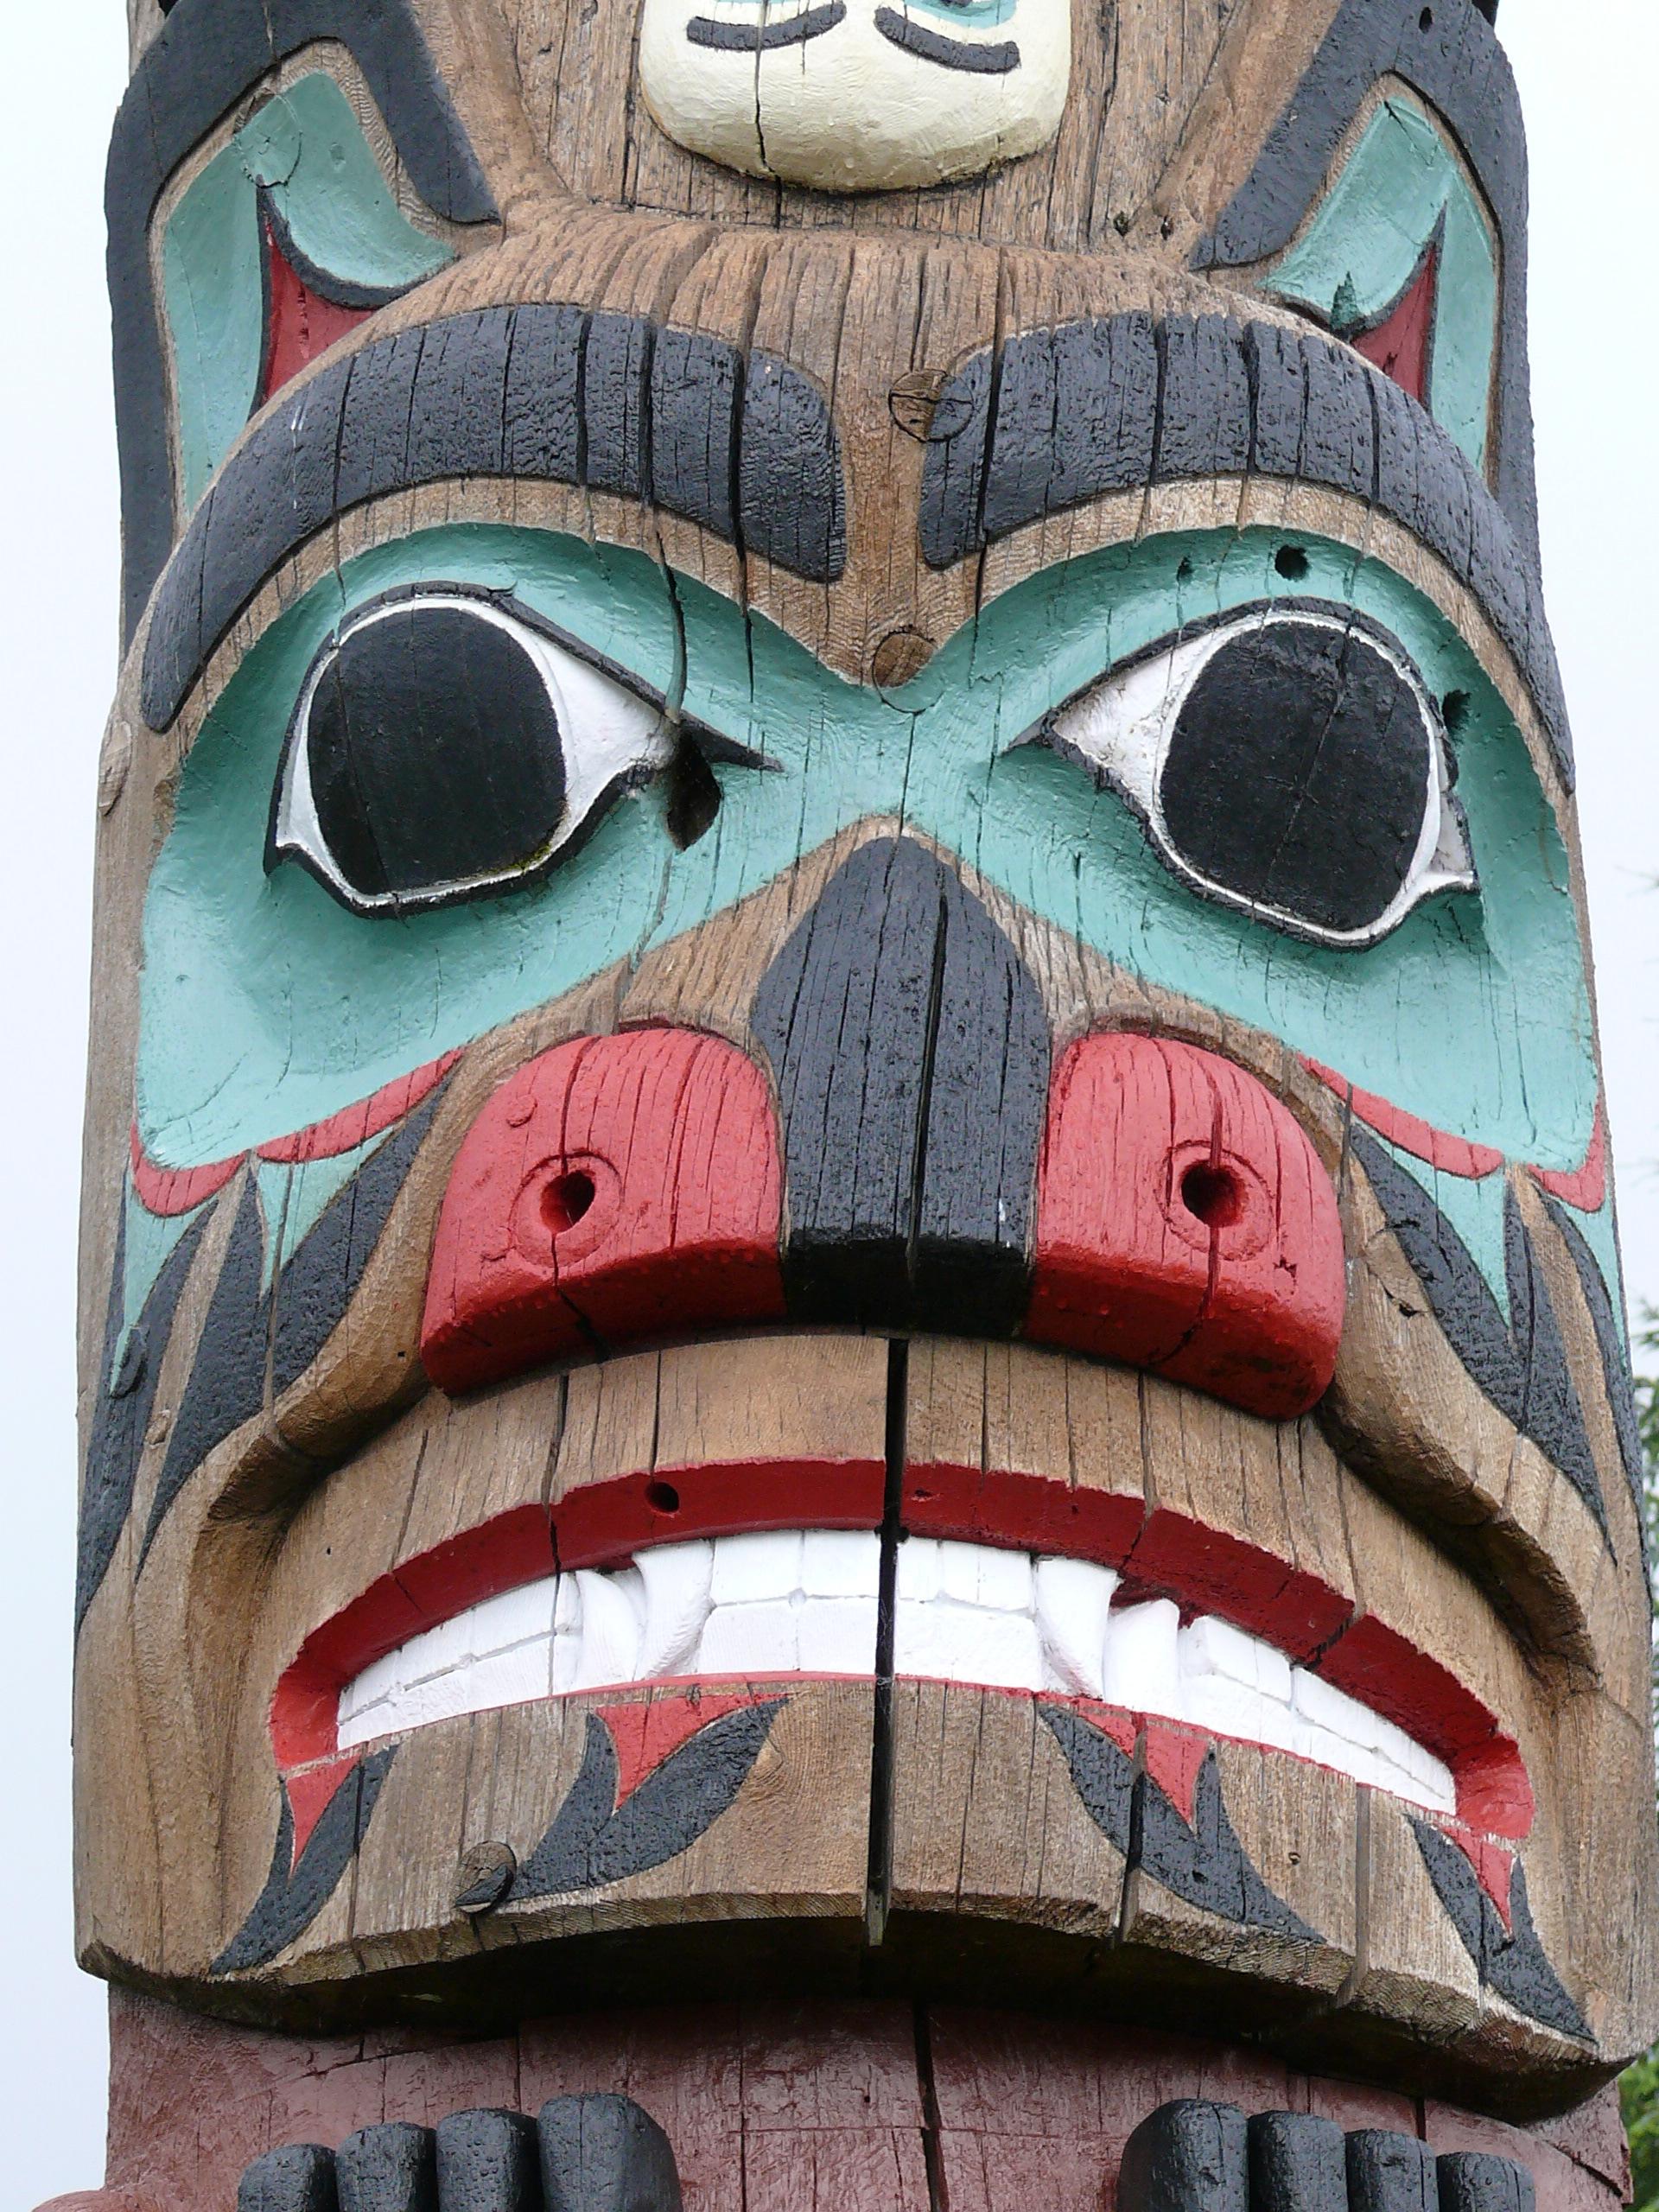 Totem Pole Faces